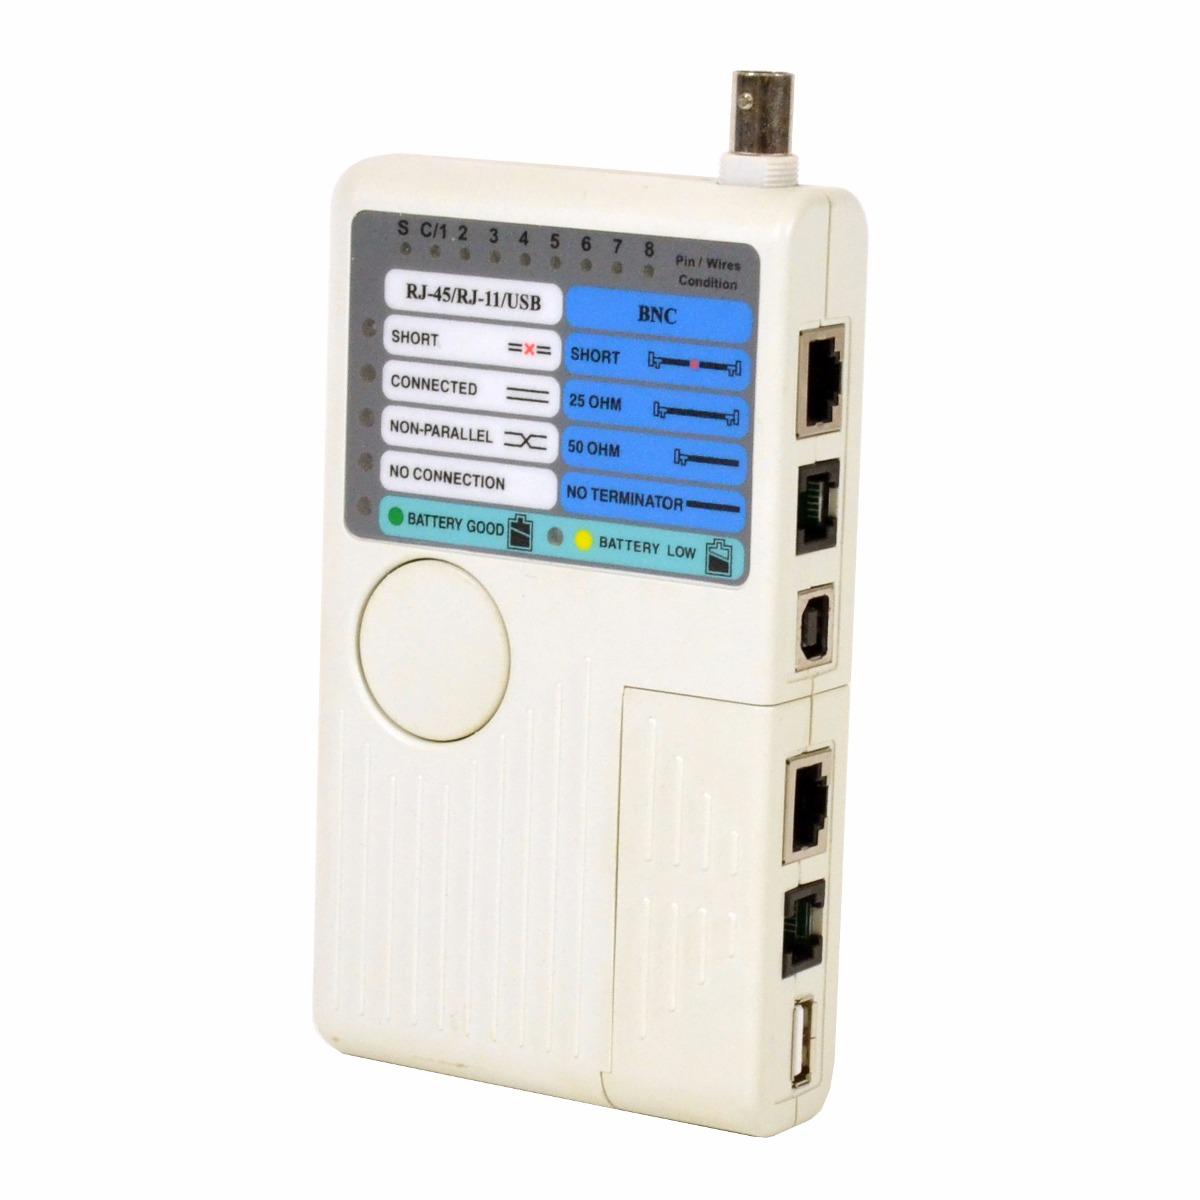 Tester Probador Cable Red Utp Rj45 Rj11 Usb Bnc Coaxial